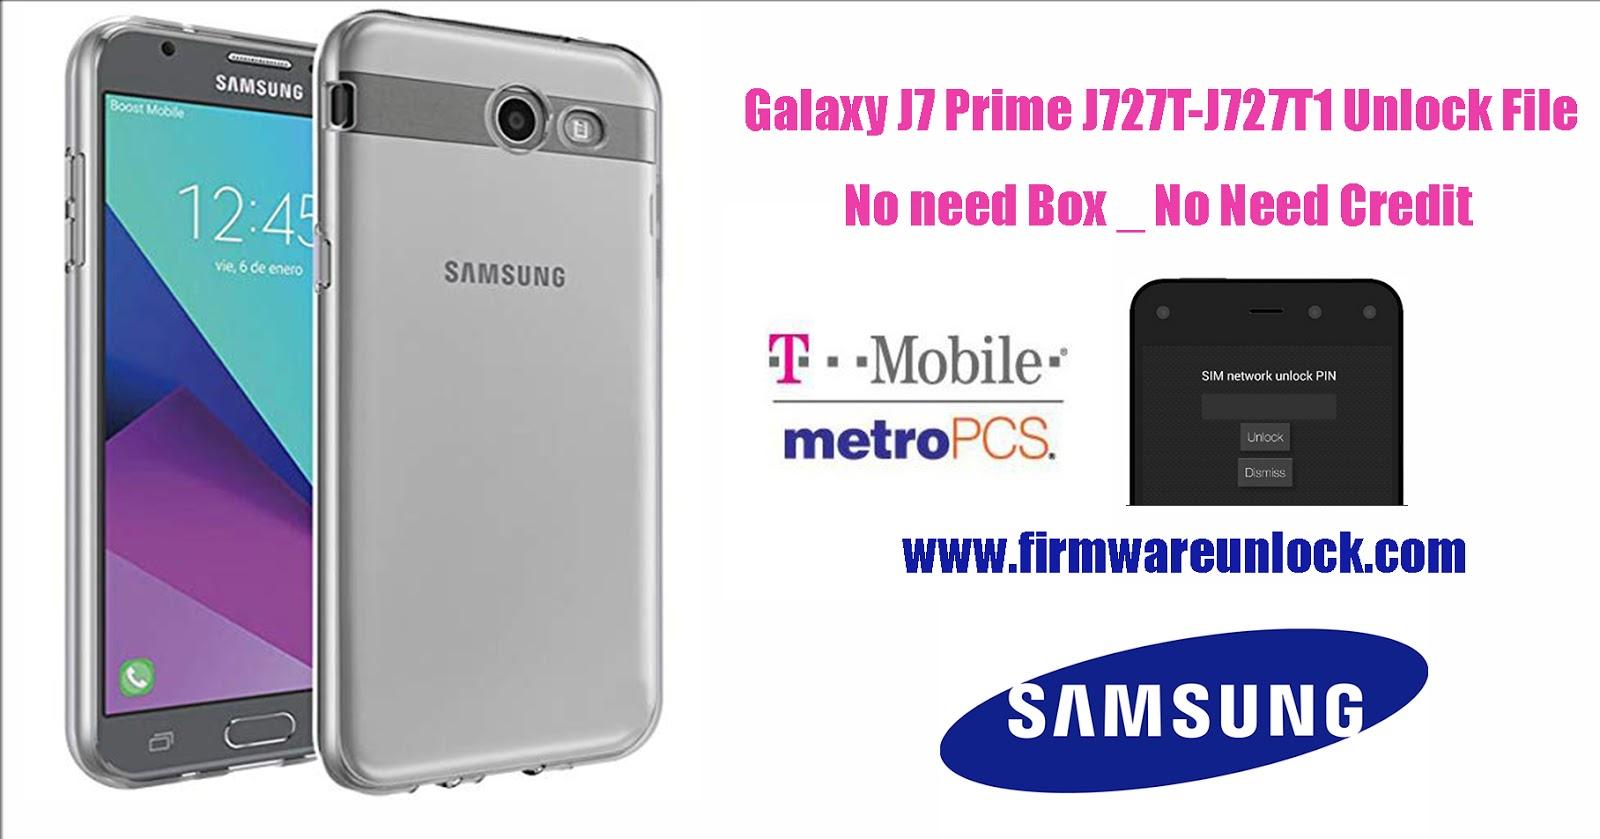 J7 Prime J727T-J727T1 Network lock Sim (Unlock File) No Need